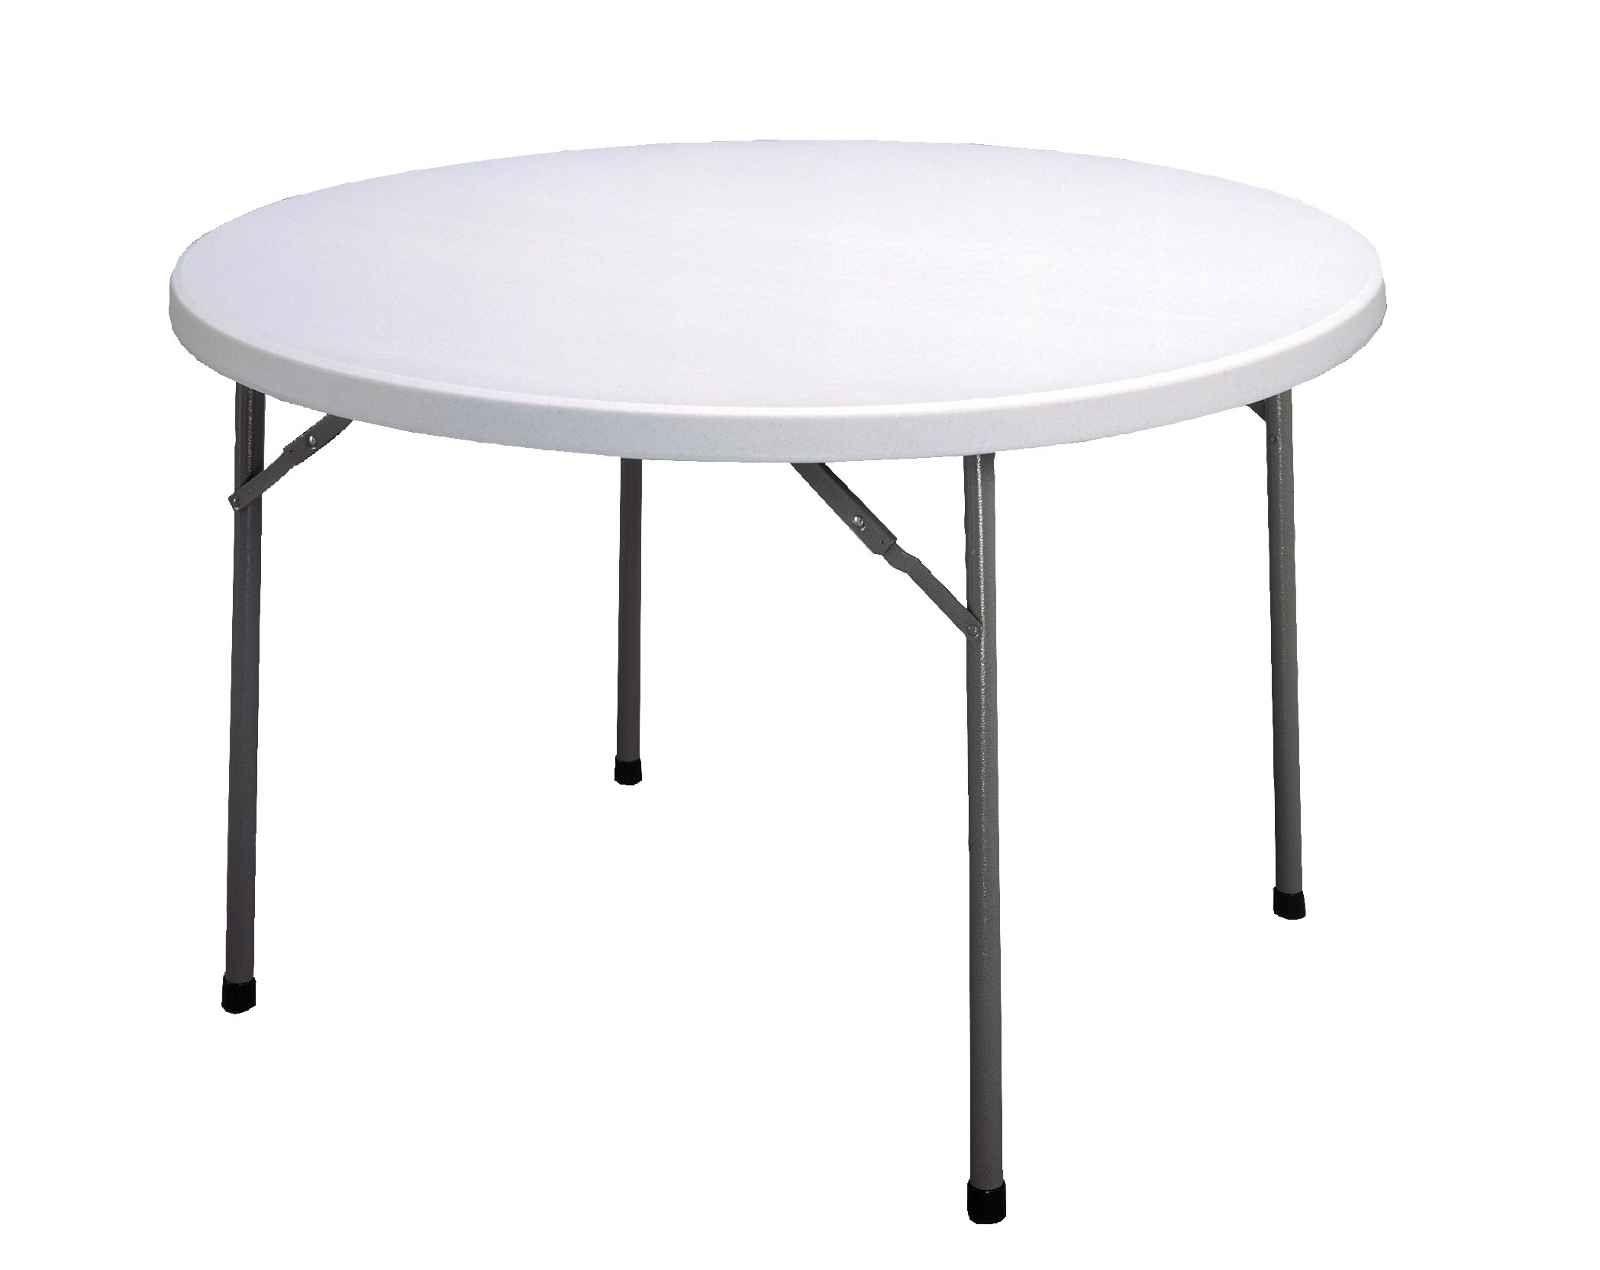 Samsonite Round Folding Card Table